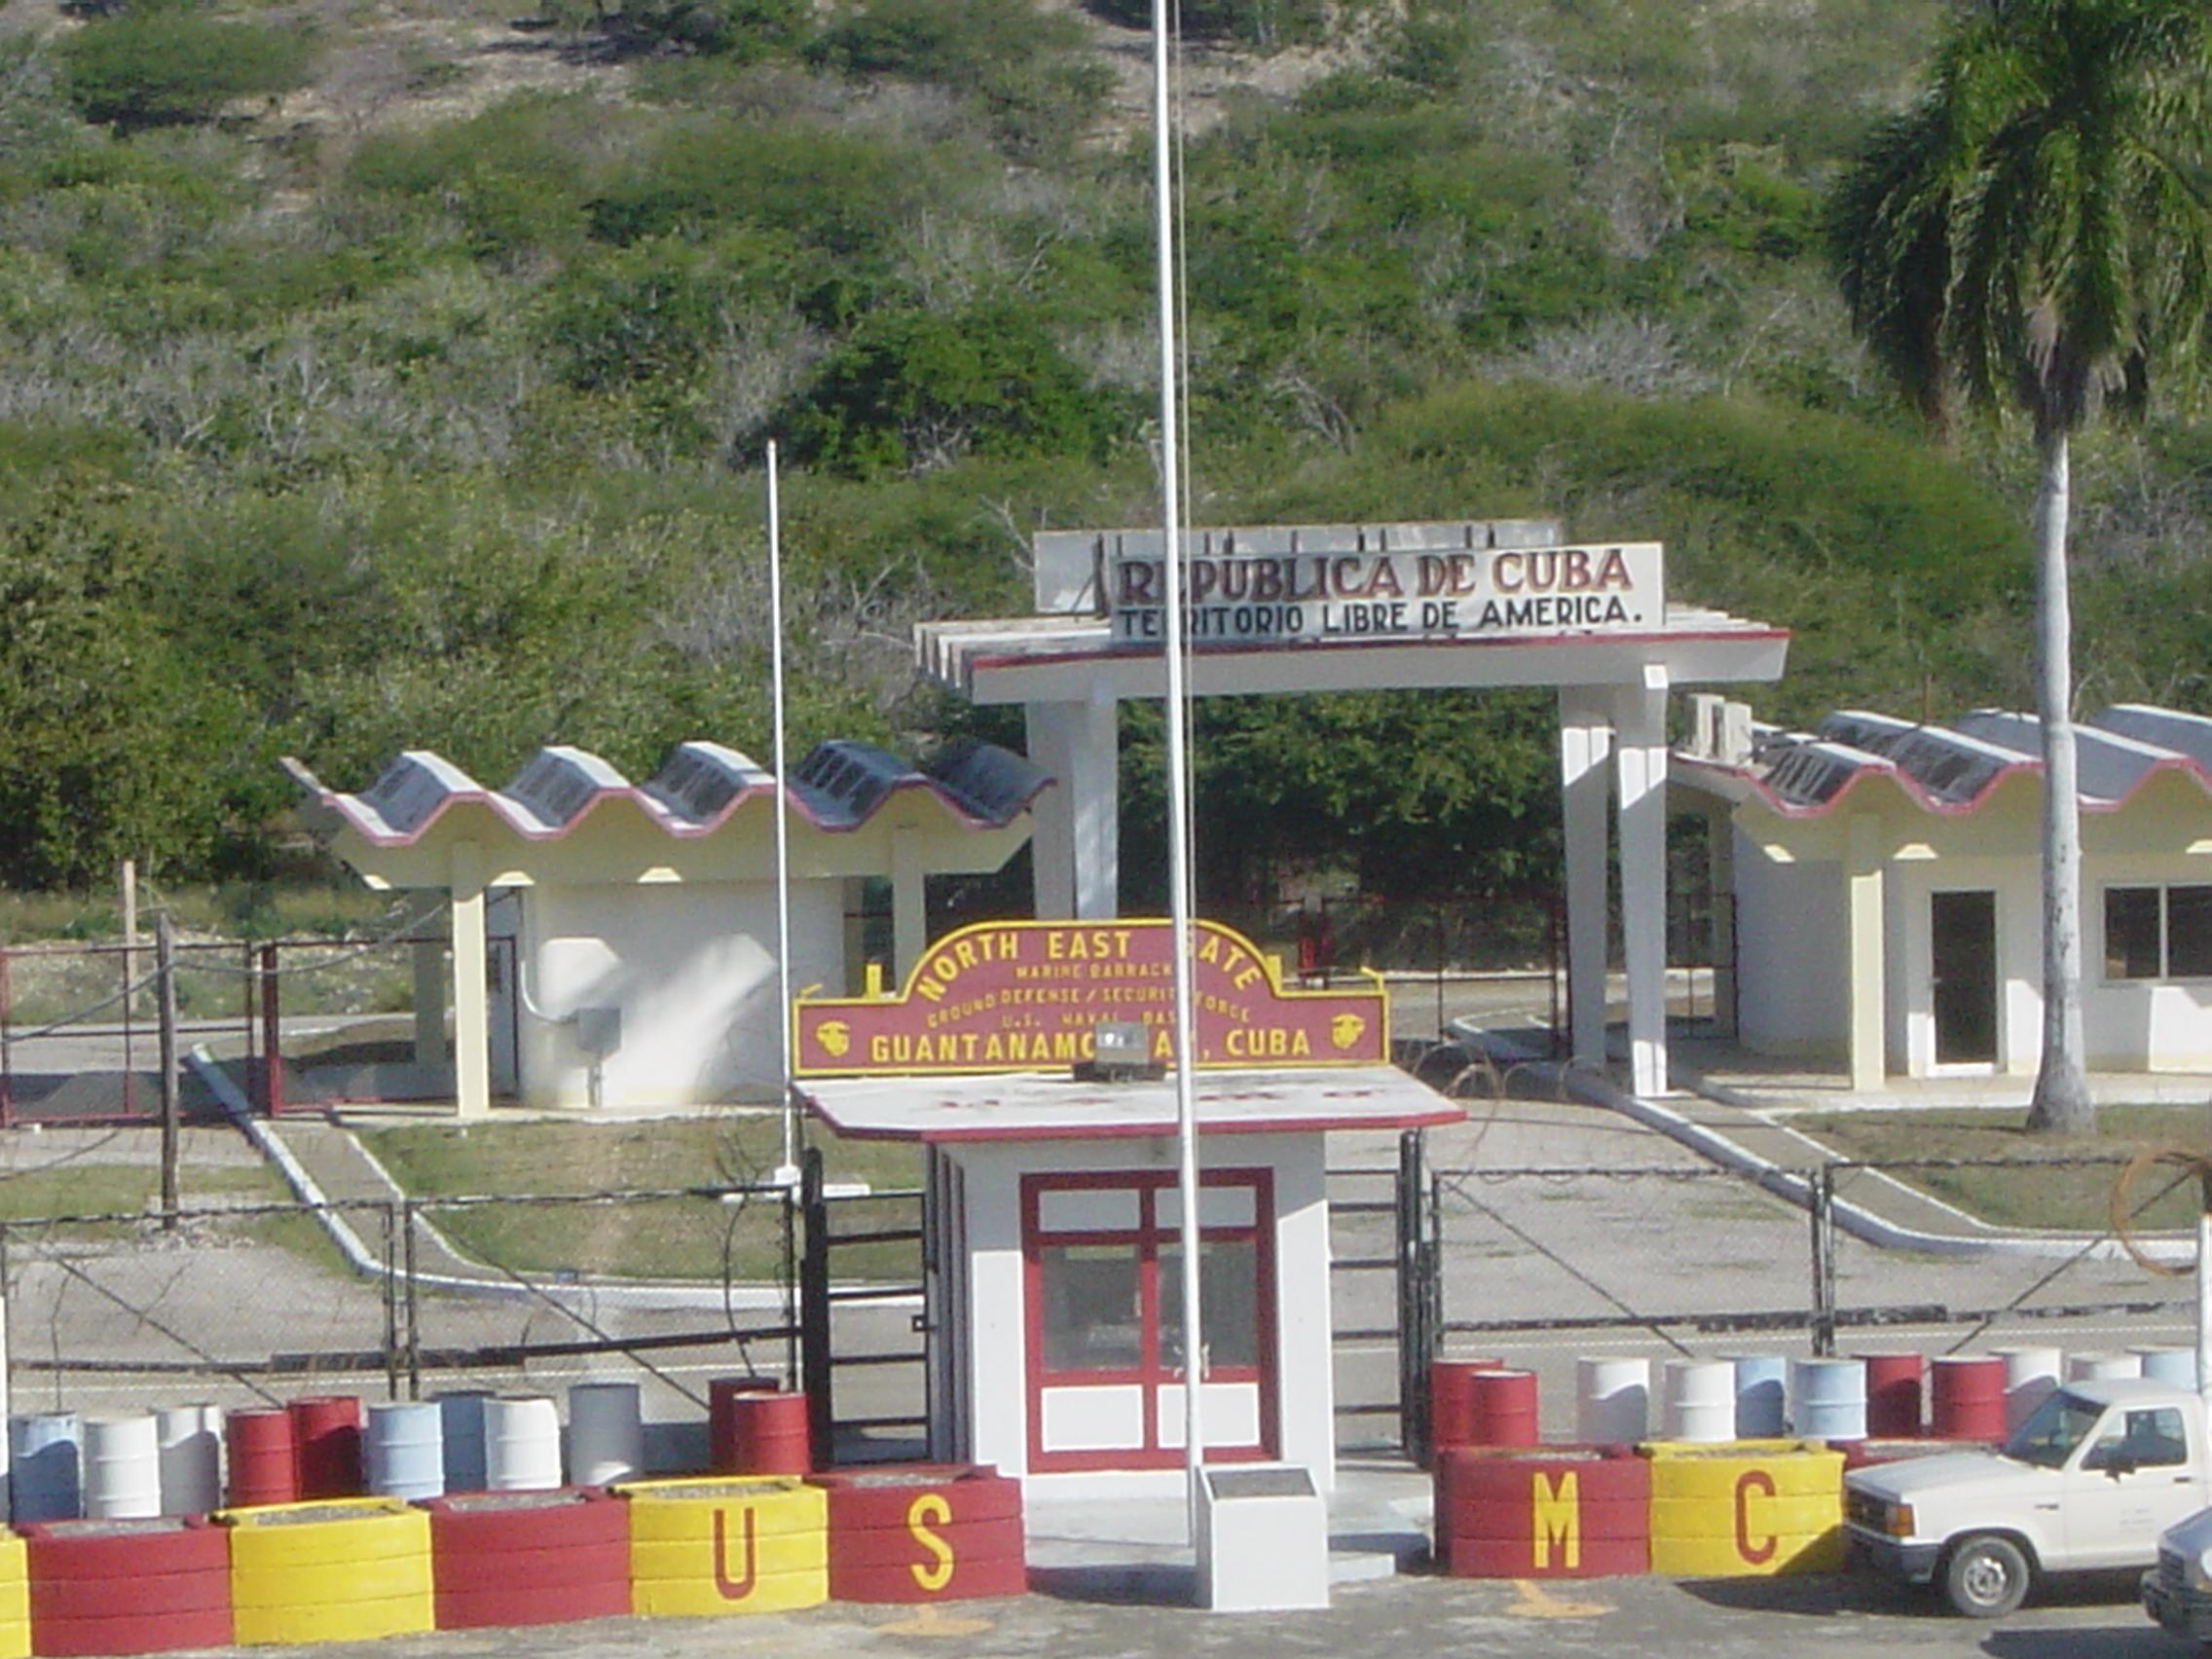 Northeast gate of the Guantanamo Bay Naval Base, Cuba